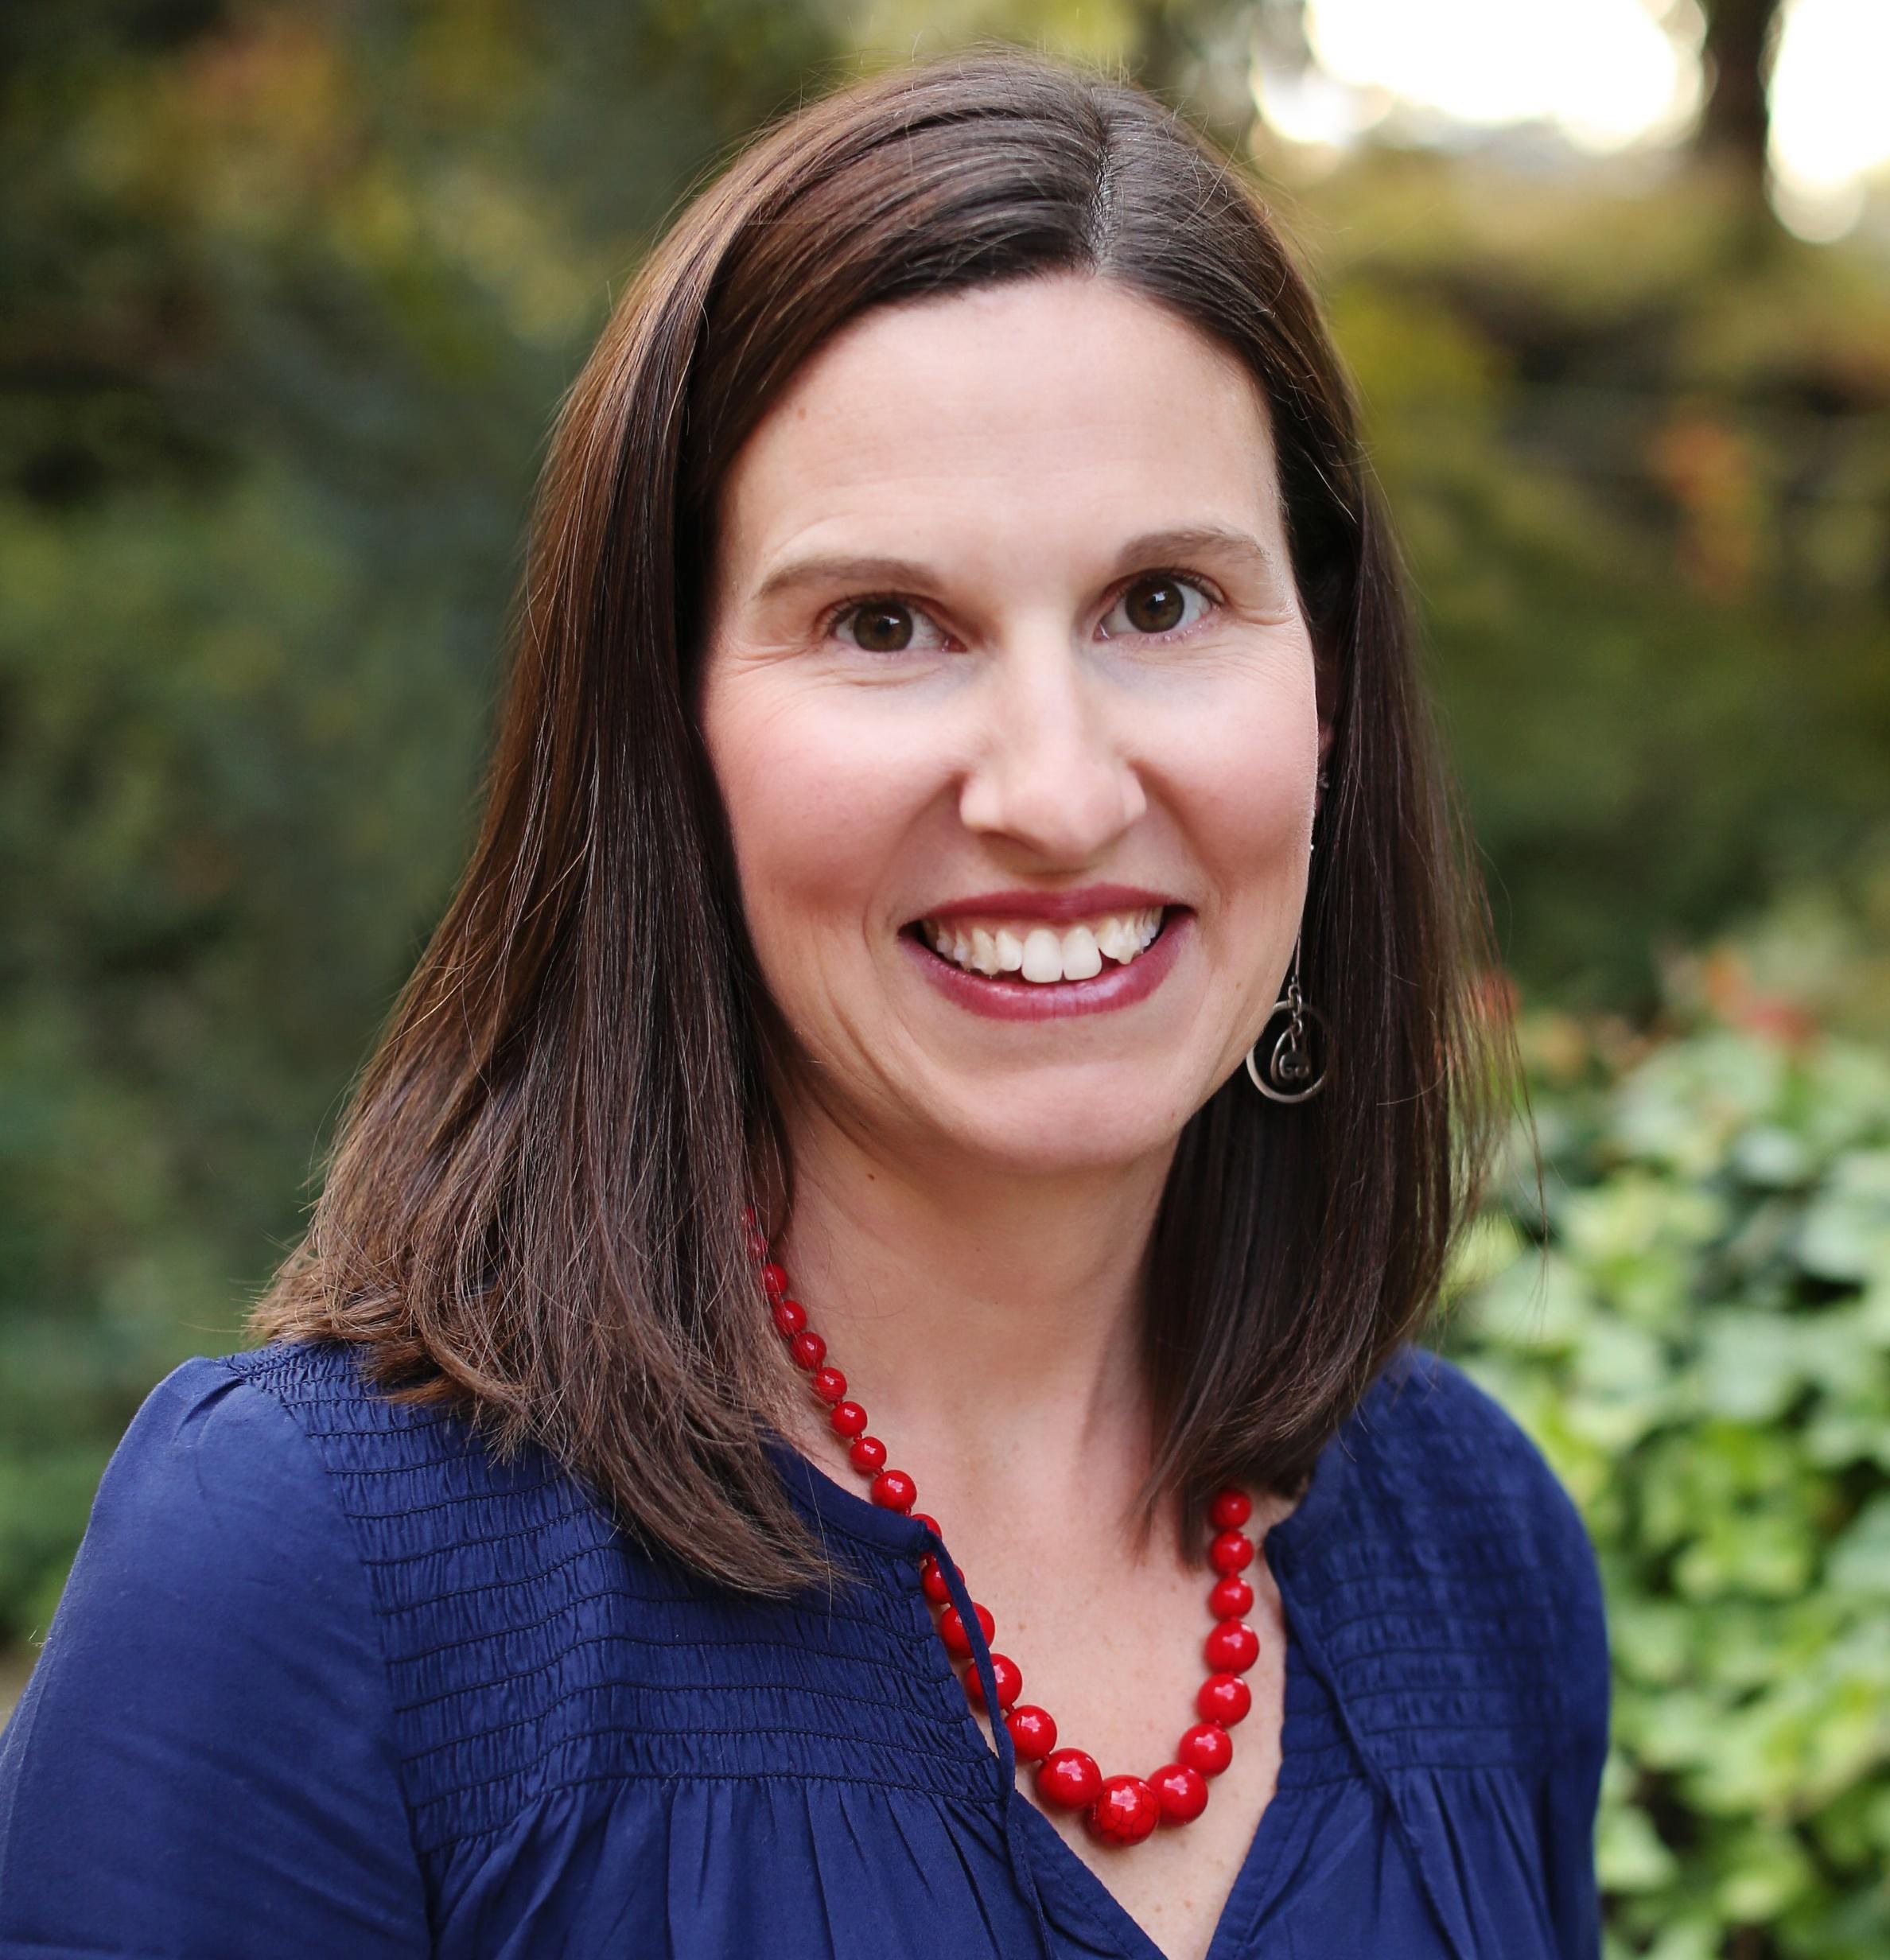 Sarah Hendricks - Birth/Postpartum Doulawebsite • doulamatch • fb